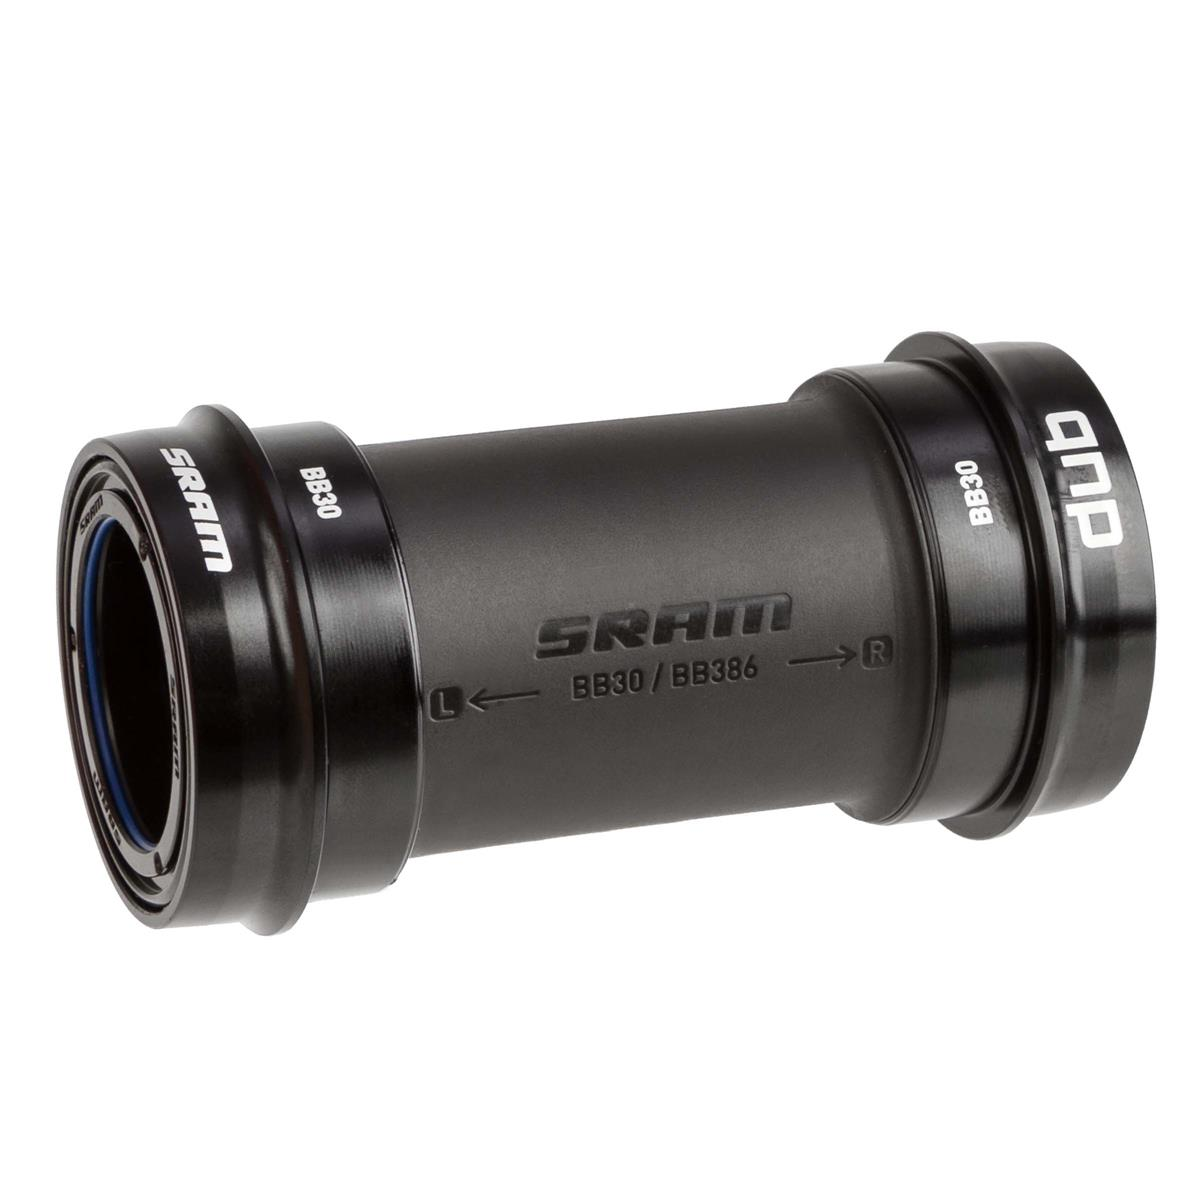 SRAM MTB-Innenlager DUB BB30, 73 mm